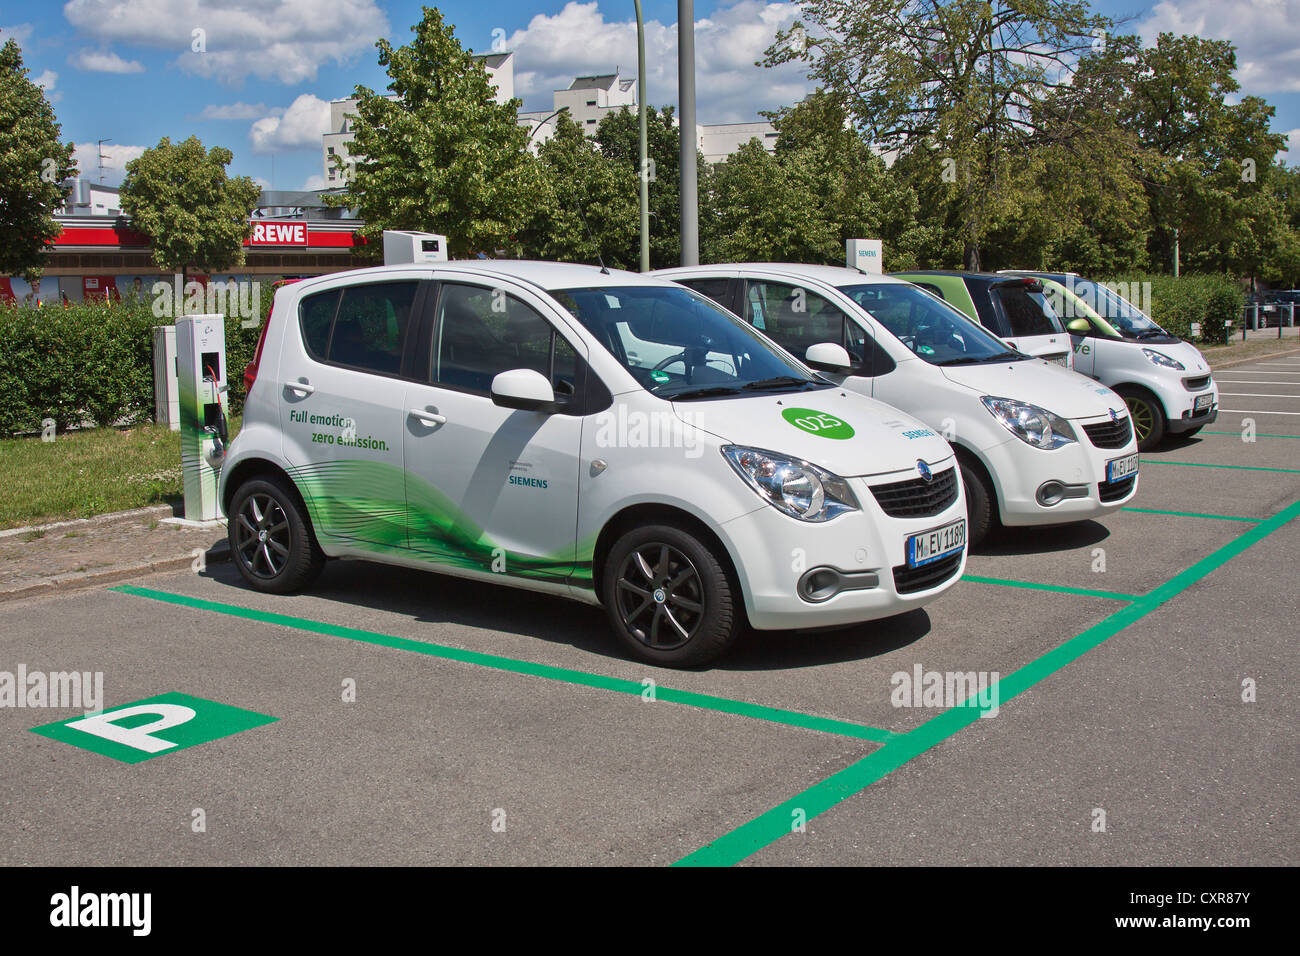 Electric Car Siemens Fuel Station Charging Station Rwe Car